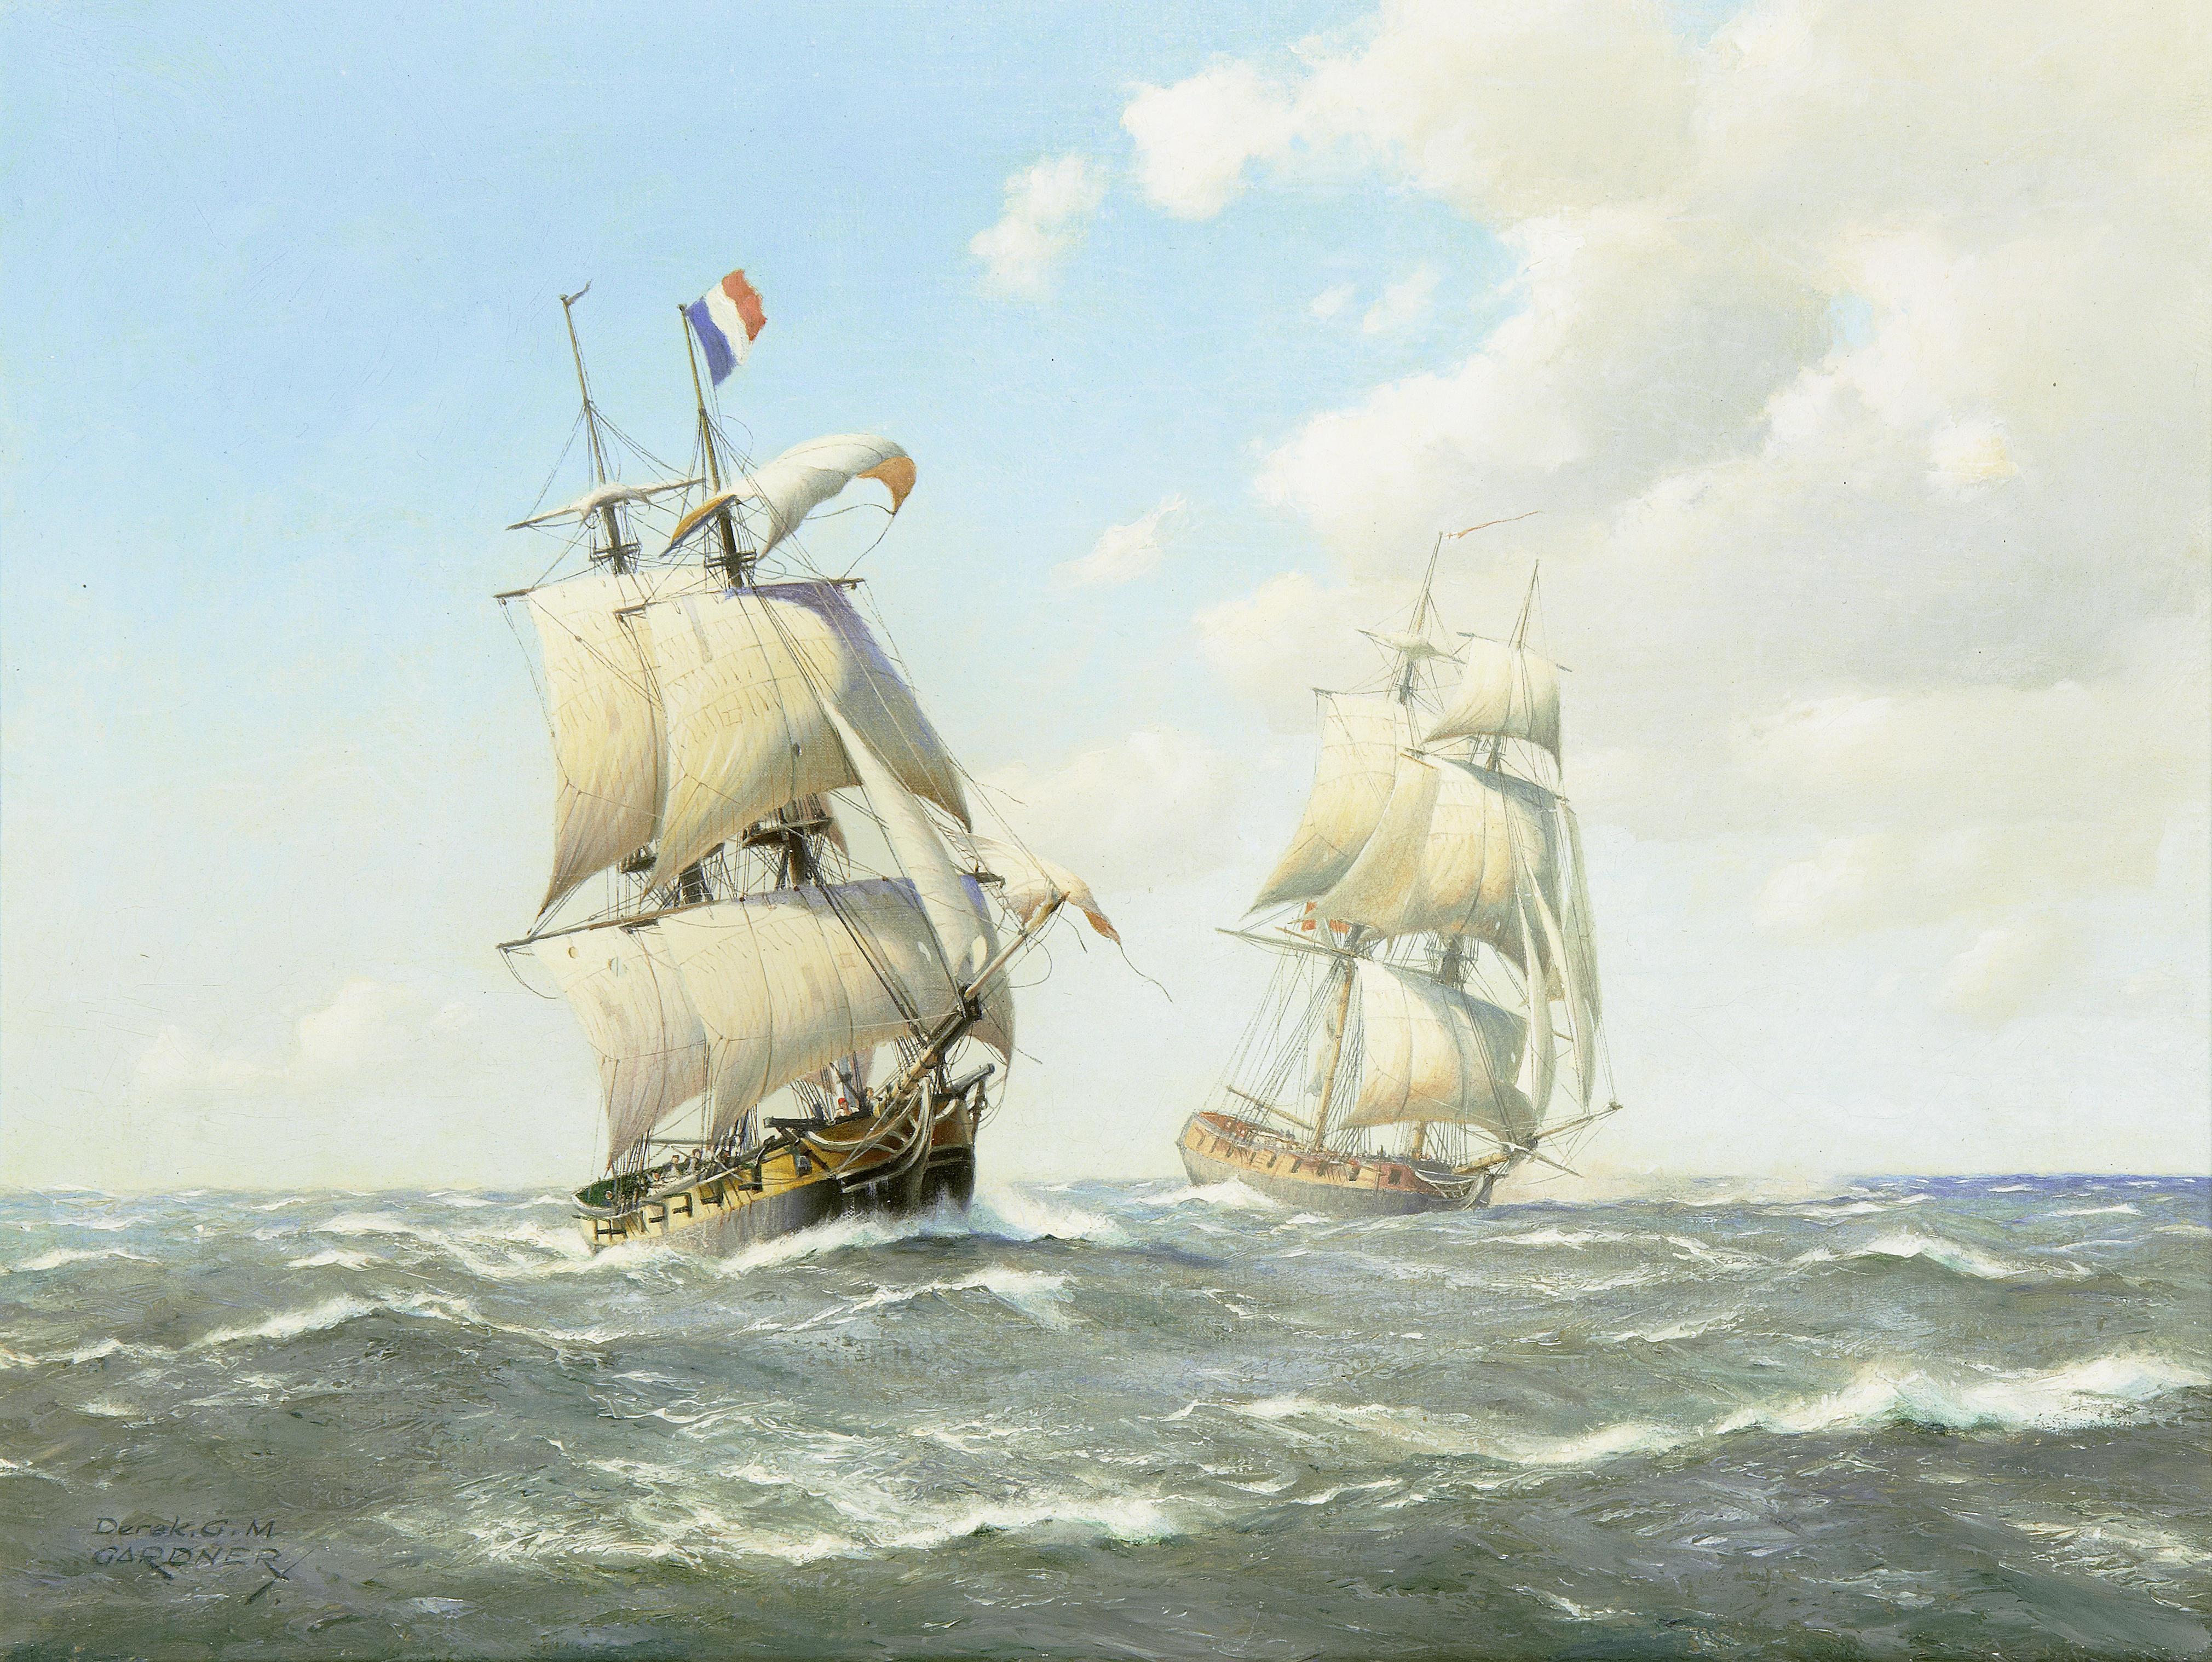 French brigantine of the 18th century.